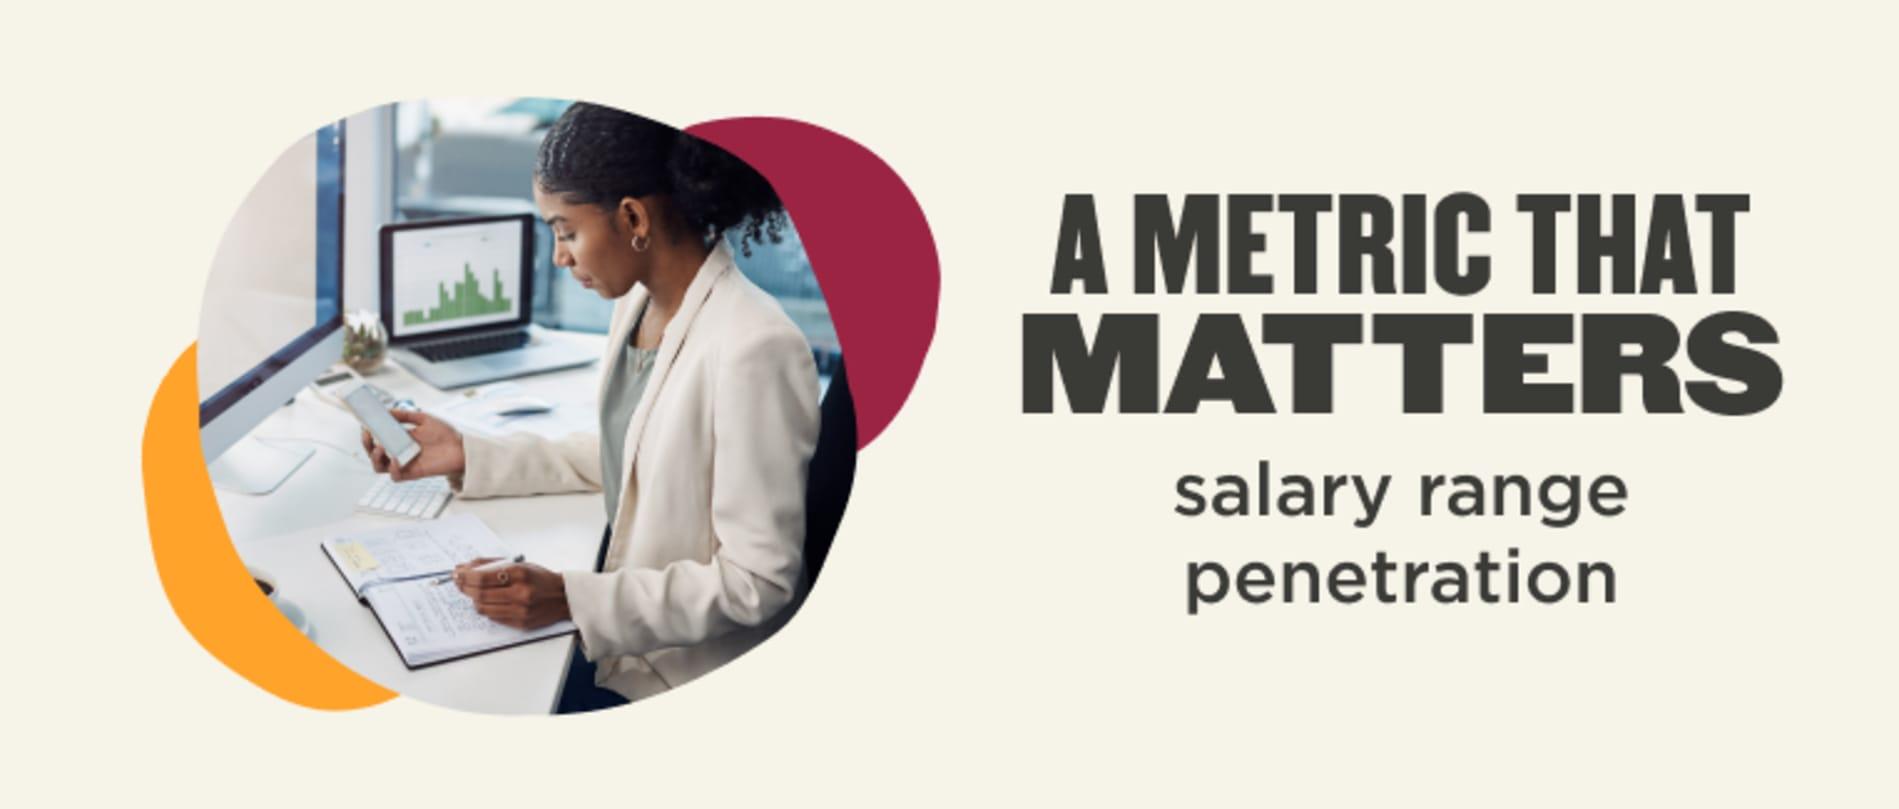 A metric that matters (salary range penetration)